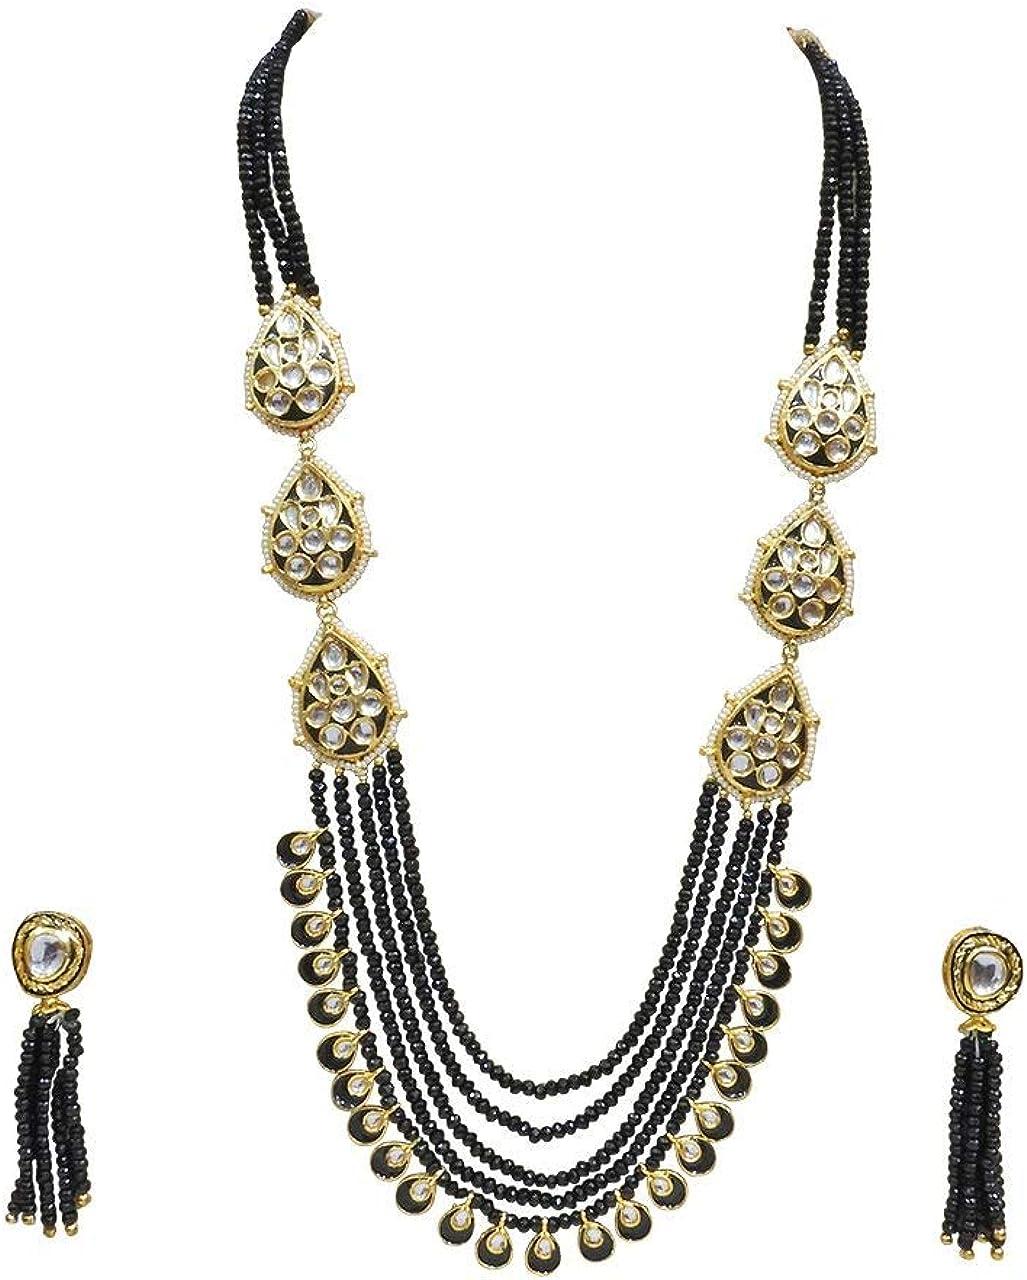 Babosa Sakhi Traditional Kundan Green Necklace Meenakari Onyx Bead Bollywood Jewelry Set